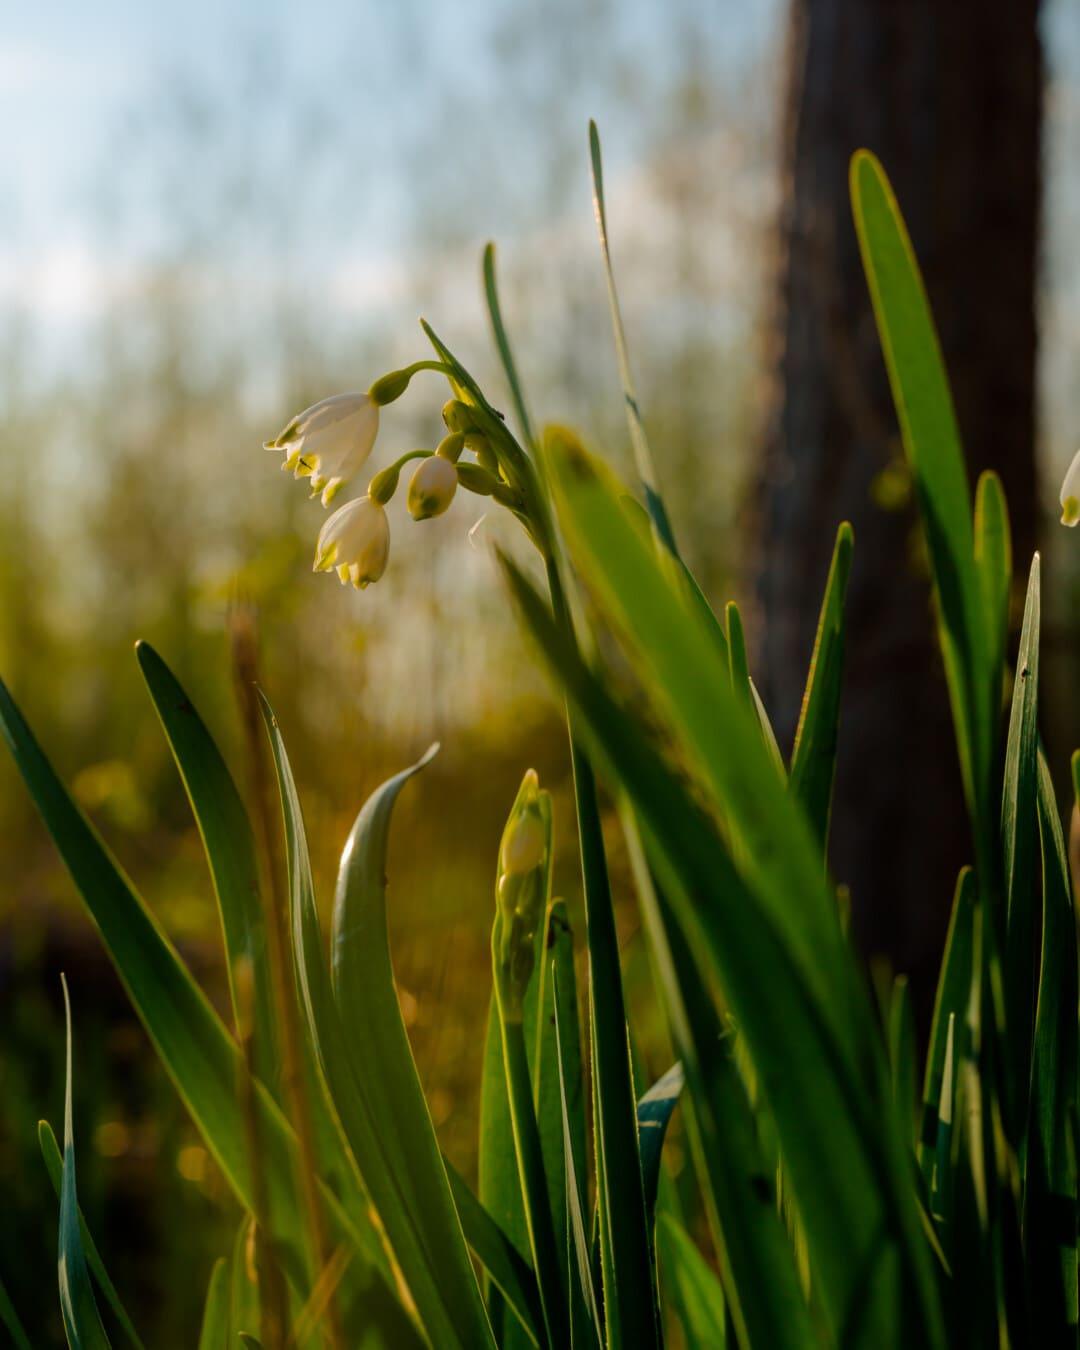 white flower, spring time, winter, grass, green leaves, spring, field, flower, leaf, plant